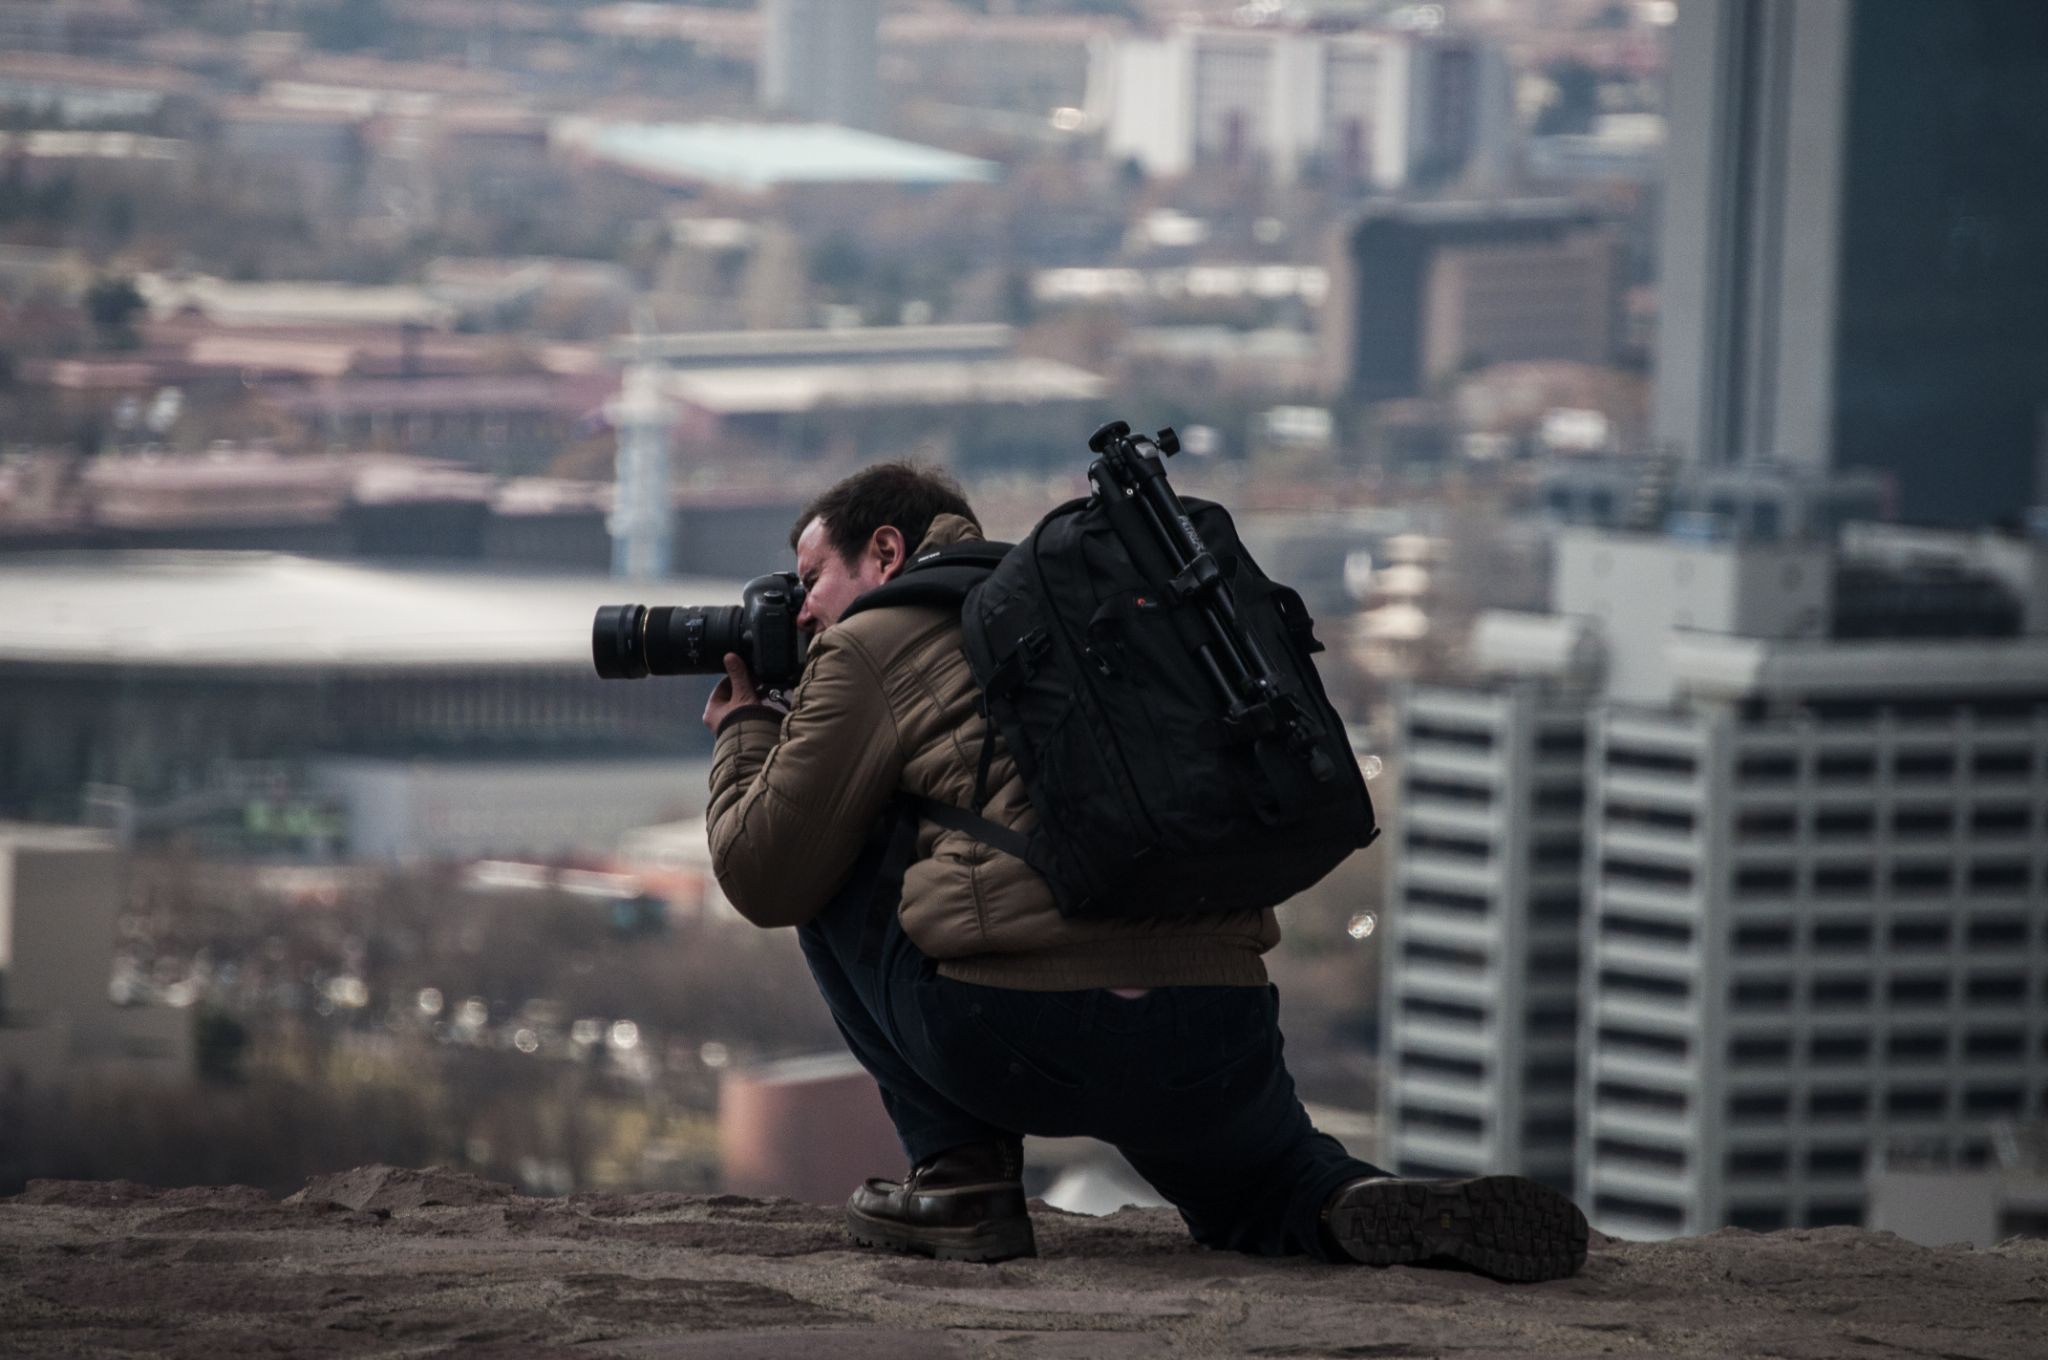 Photographer by AyseKarabulut